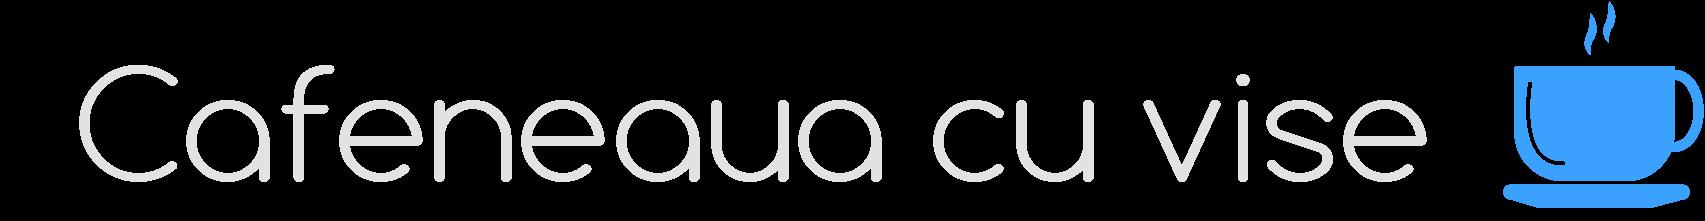 Cafeneaua cu Vise Logo